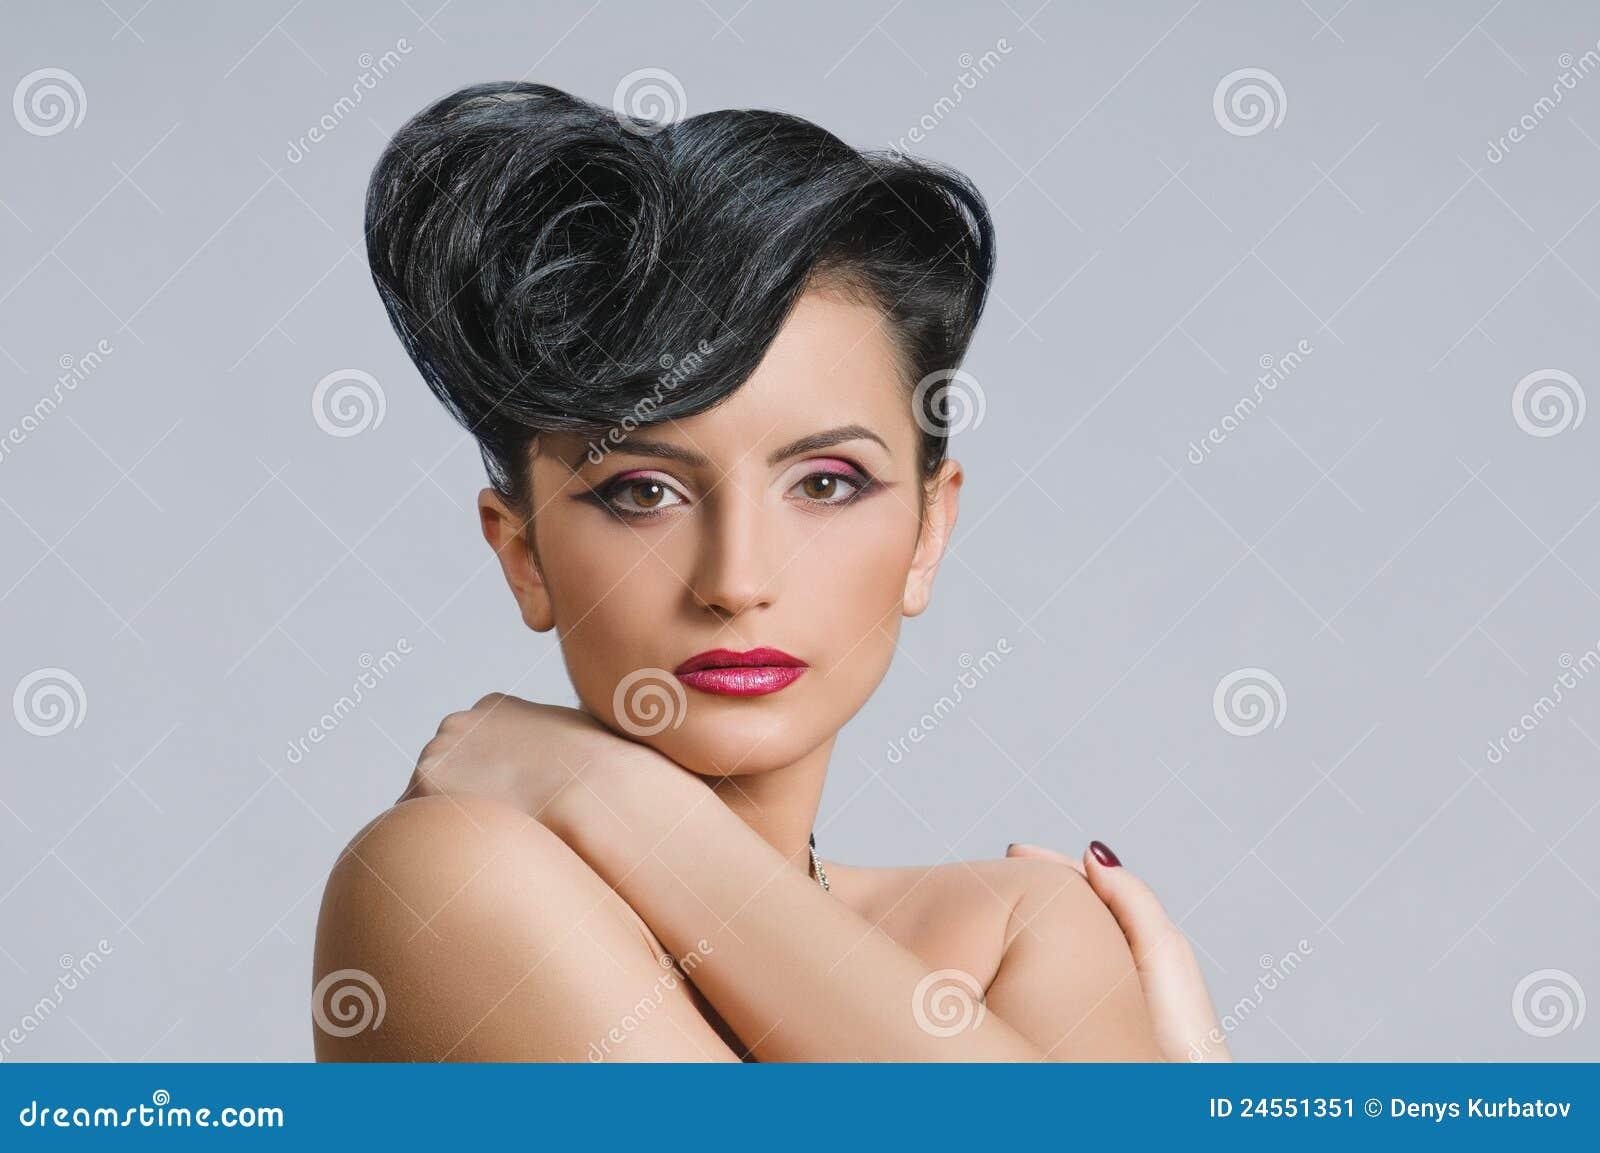 Coiffure Quiff Stock Image Image Of Fashion Head Cute 24551351